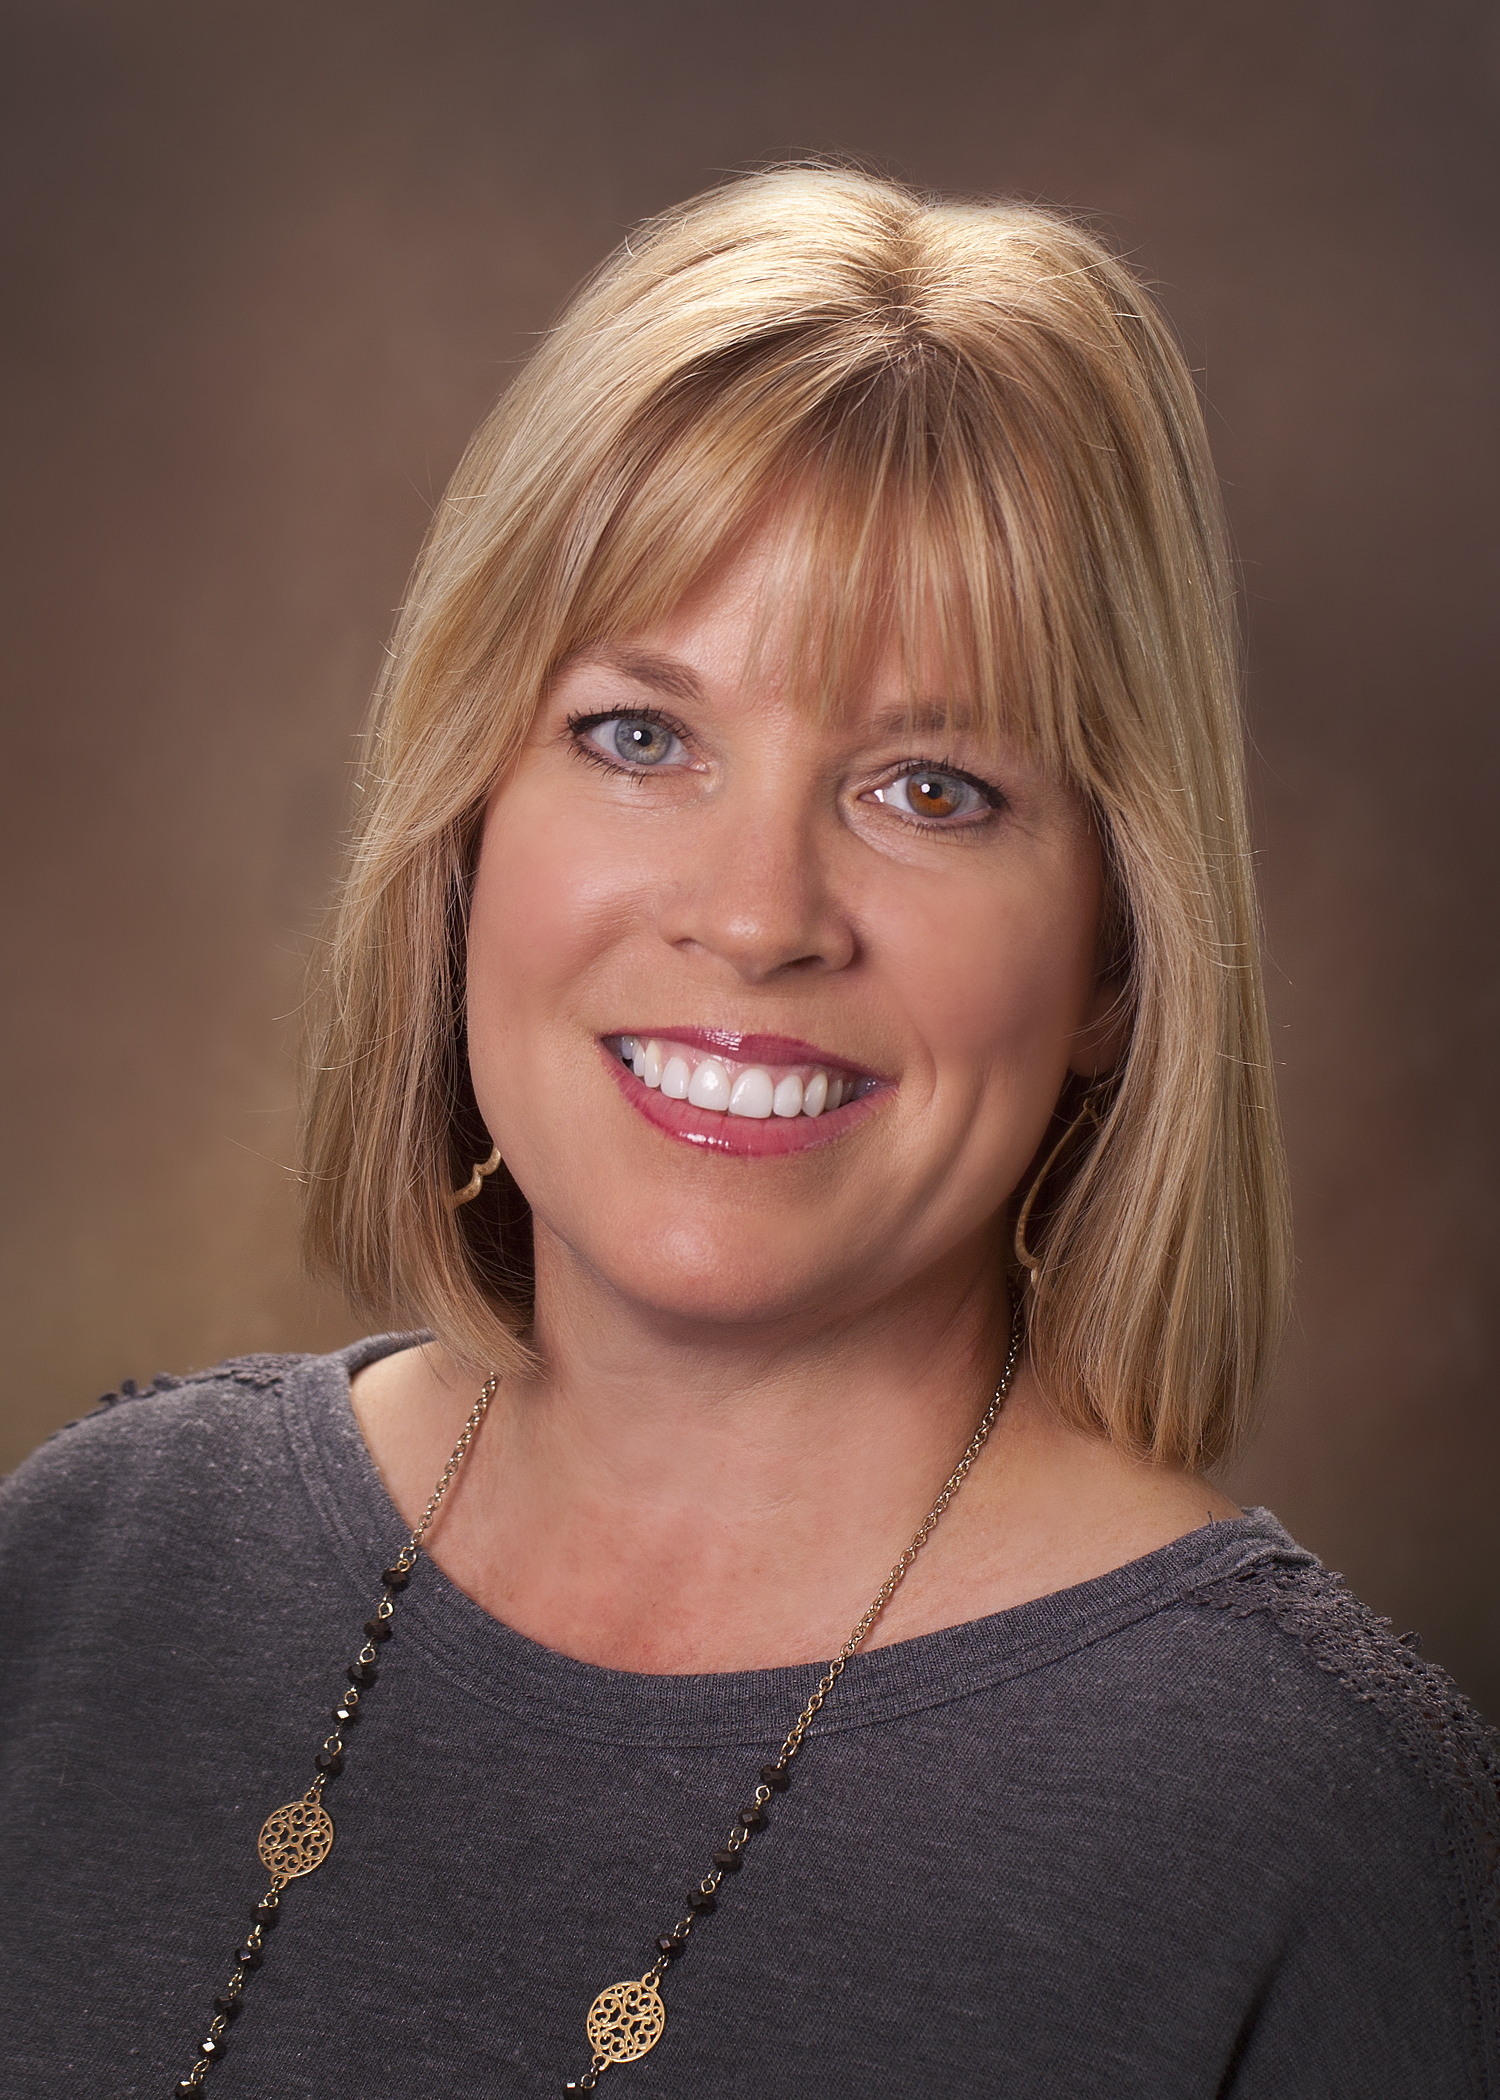 Phyllis Hobbs